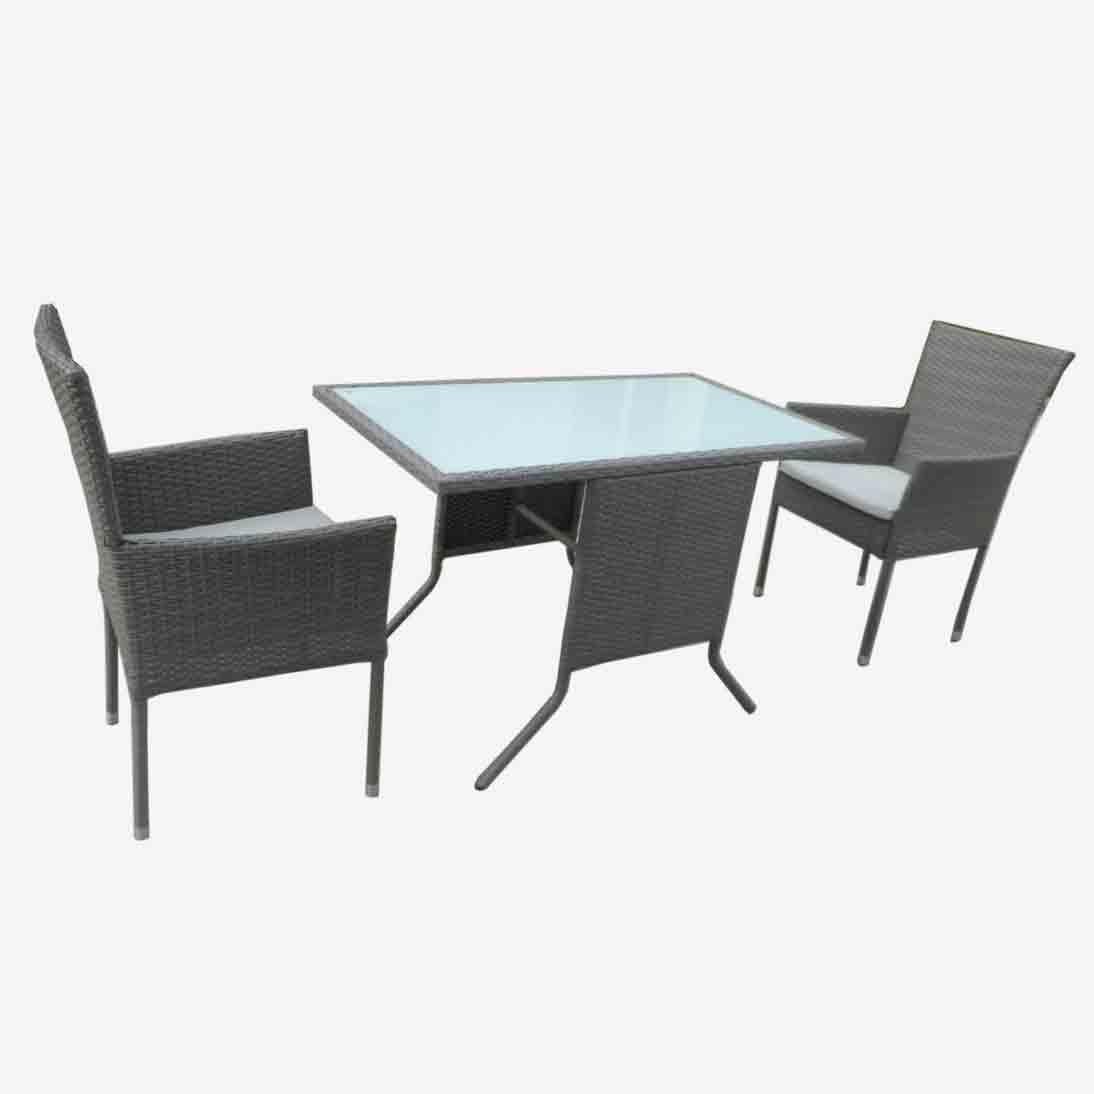 High definition Wicker Furniture Set - JJS229ST Steel frame rattan sofa set – Jin-jiang Industry